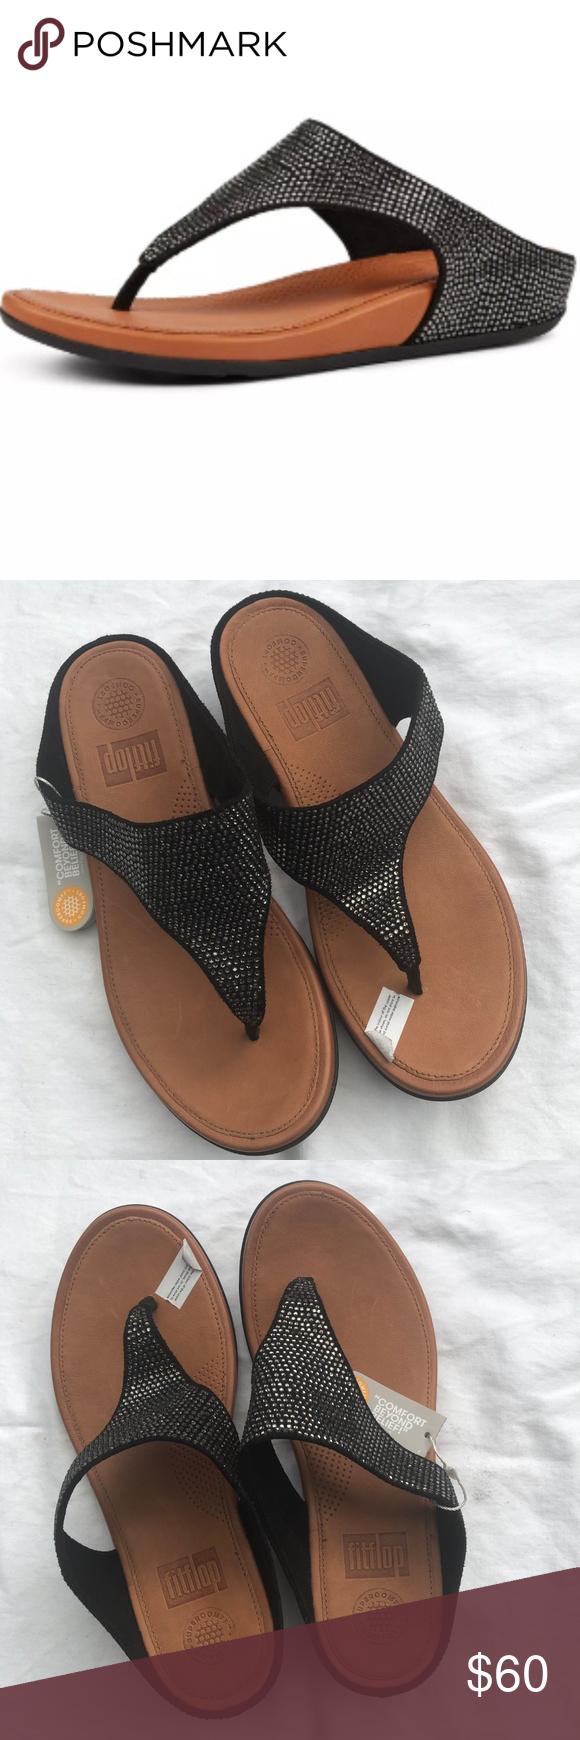 bc6e1cca4 NWT Fitflop Banda Glitz Thong Sandals Black 6M Smothered in shining  micro-crystals